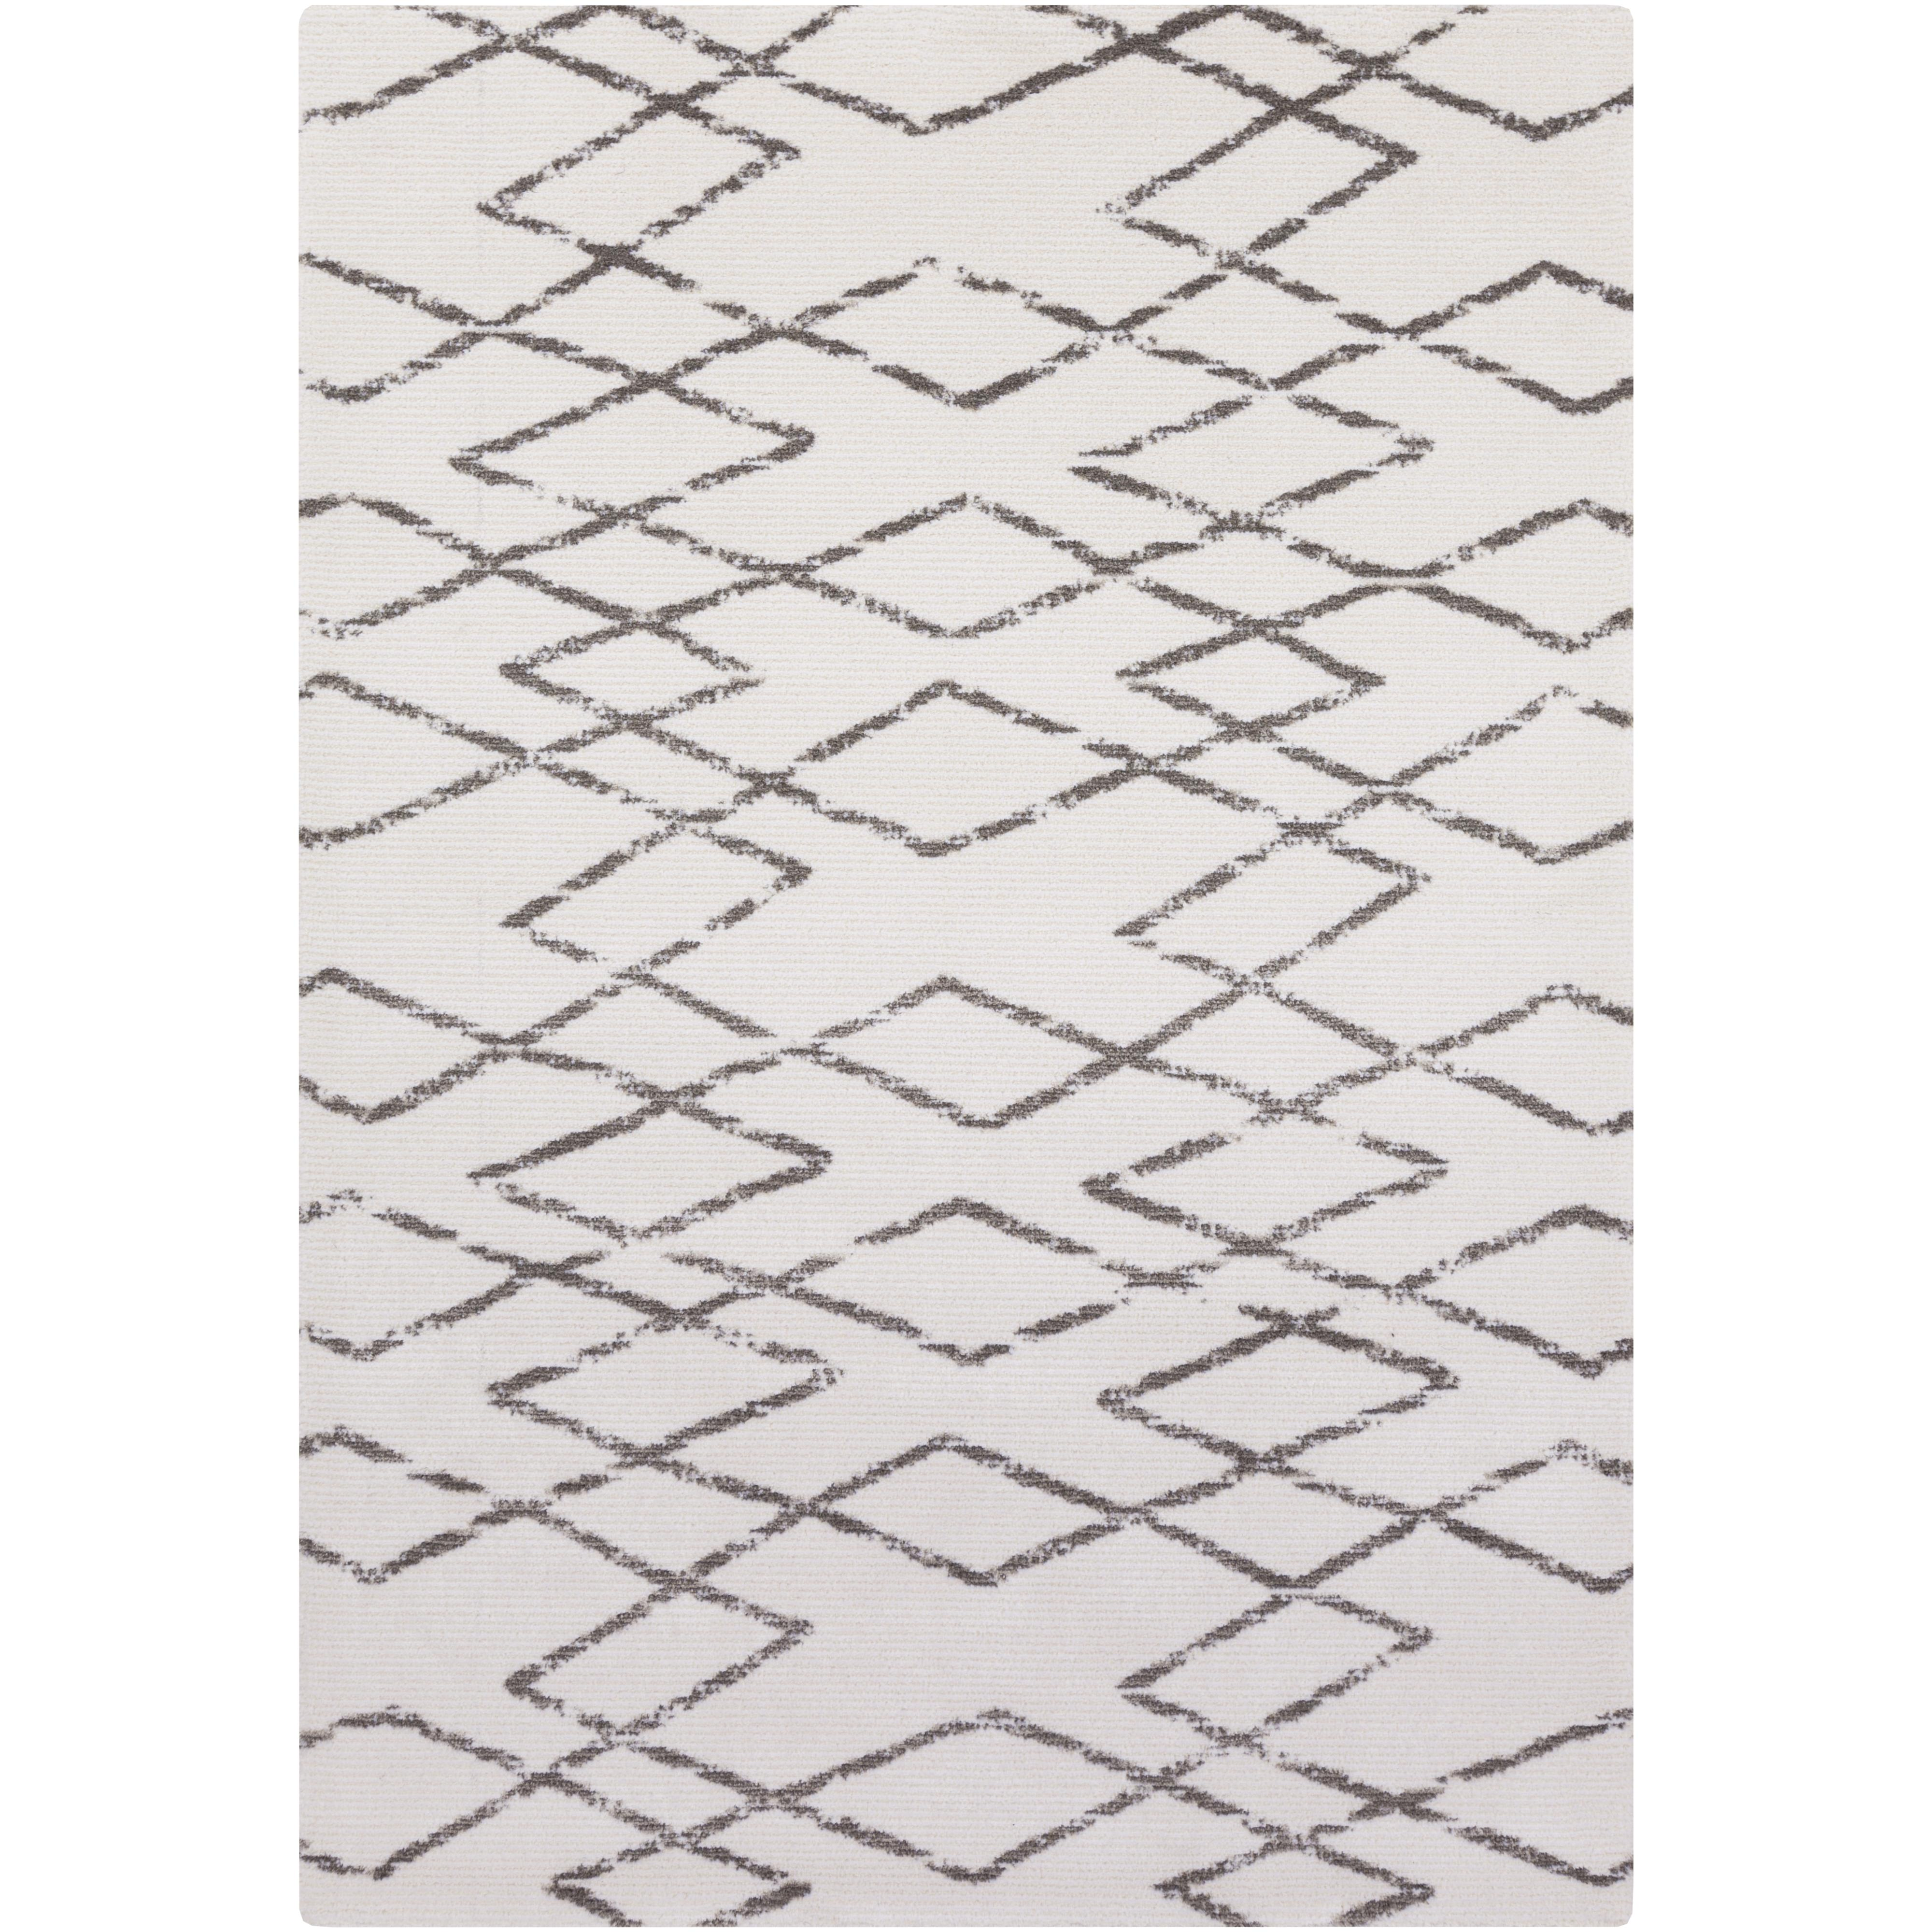 Surya Rugs Perla 2' x 3' - Item Number: PRA6001-23